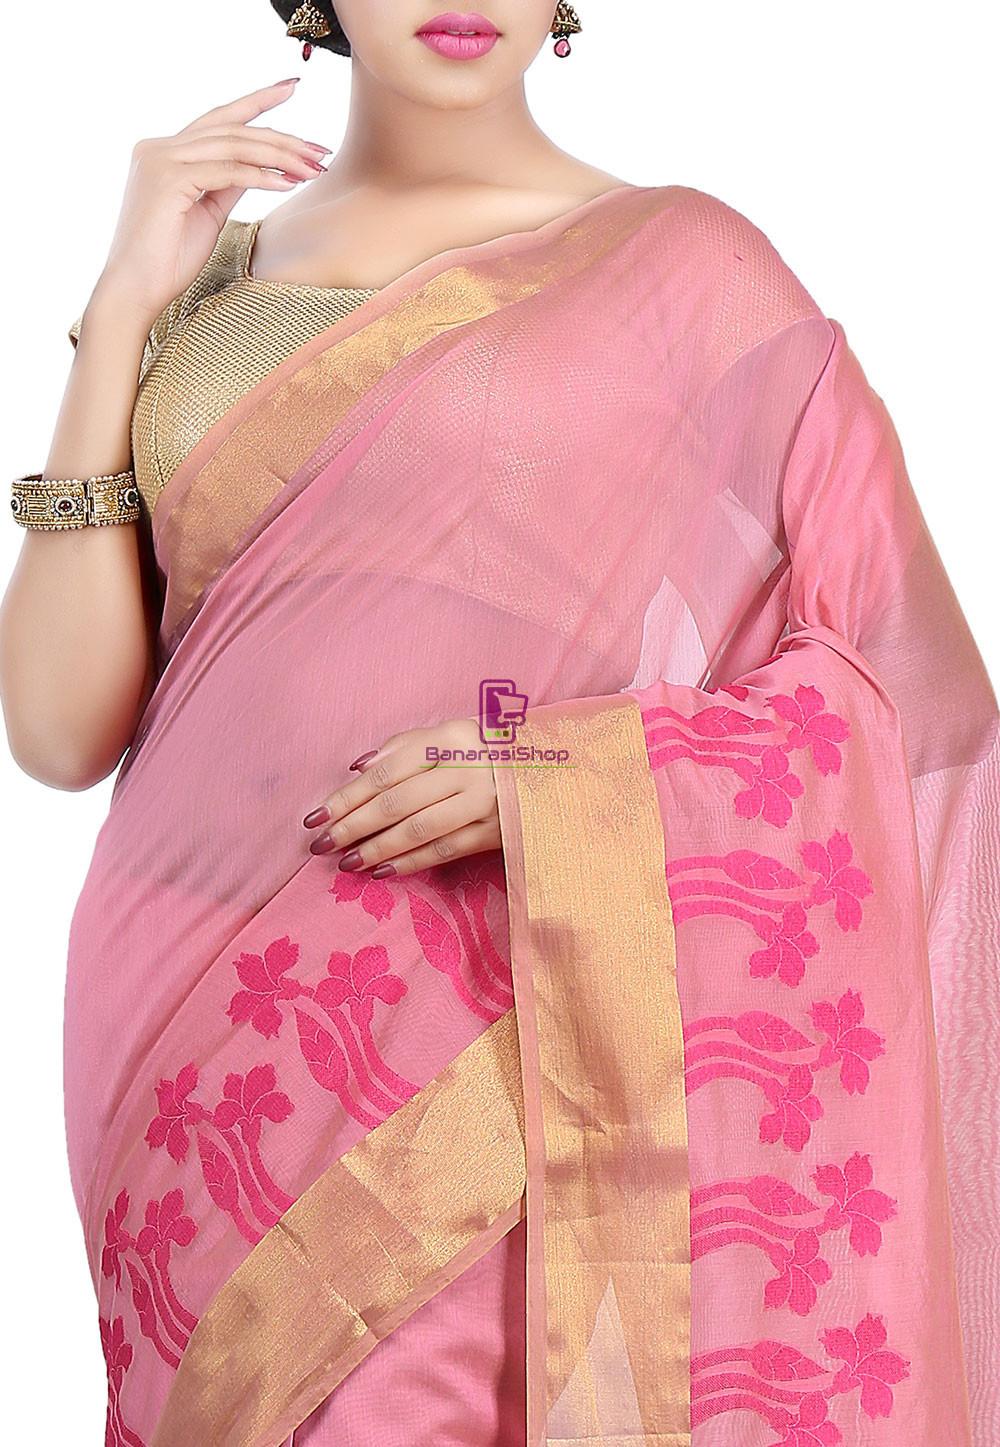 Woven Banarasi Chanderi Cotton Saree in Pink 2